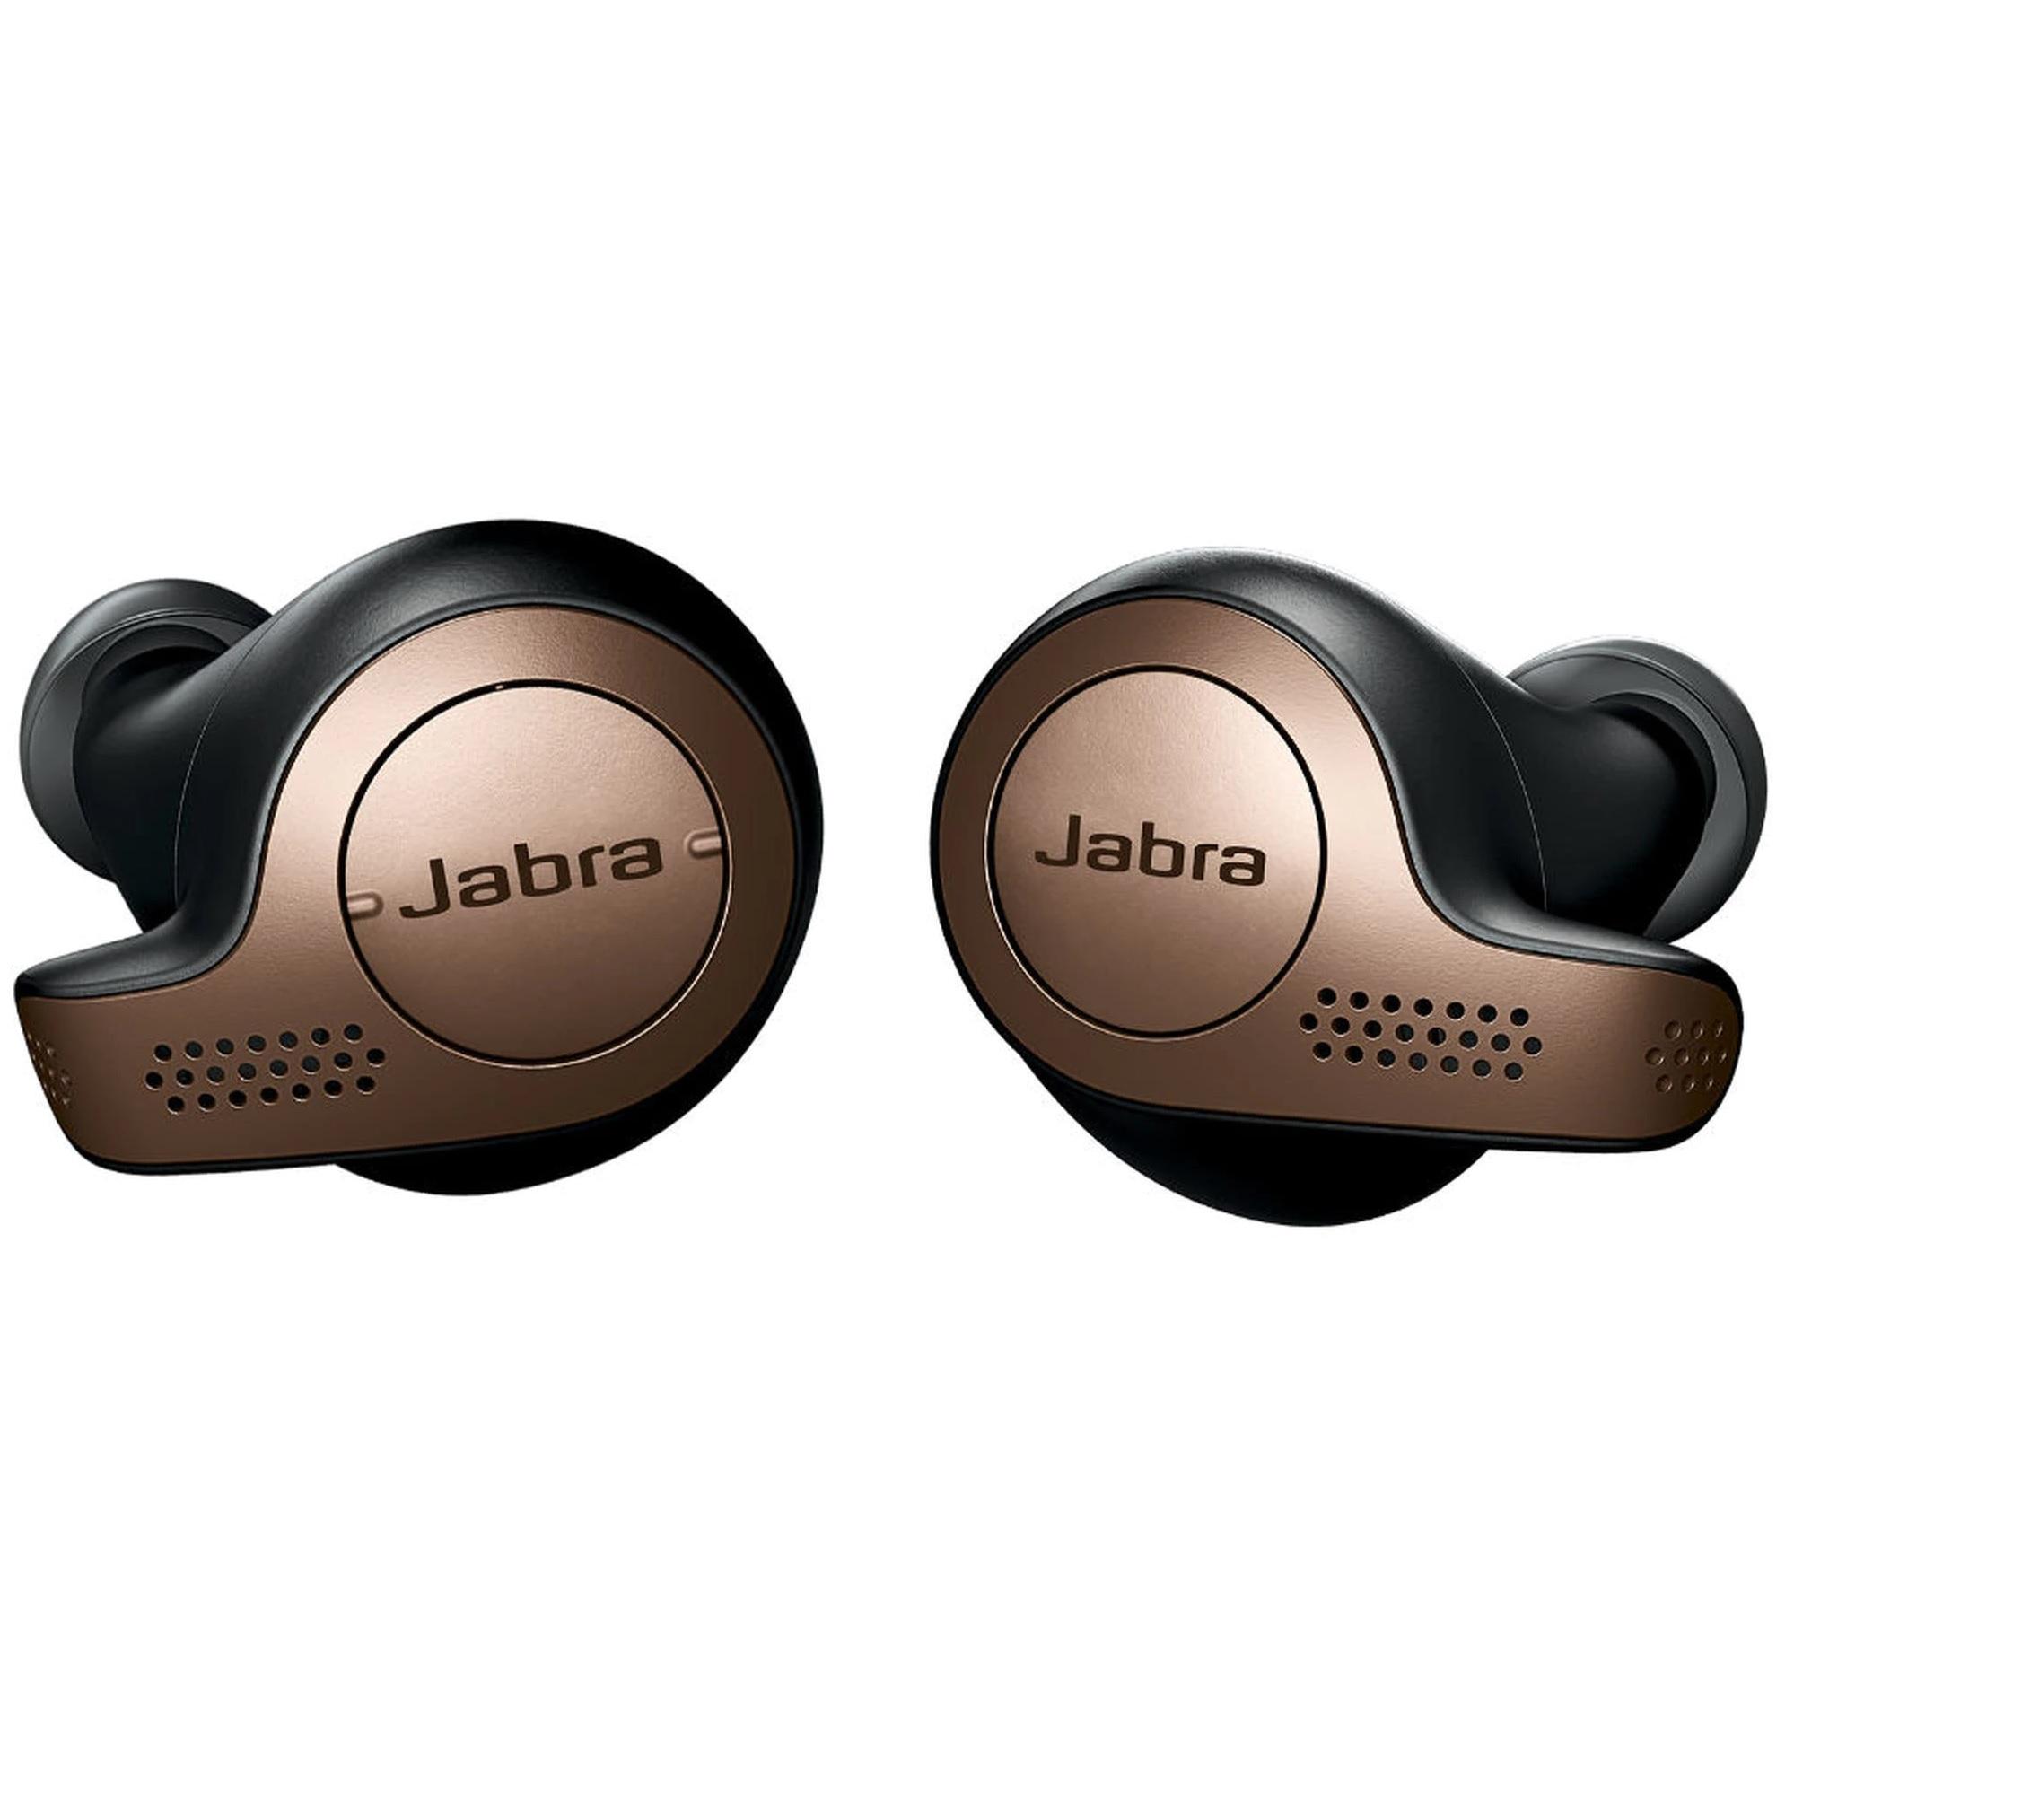 Jabra Elite 65t Bluetooth Copper Black Earbuds